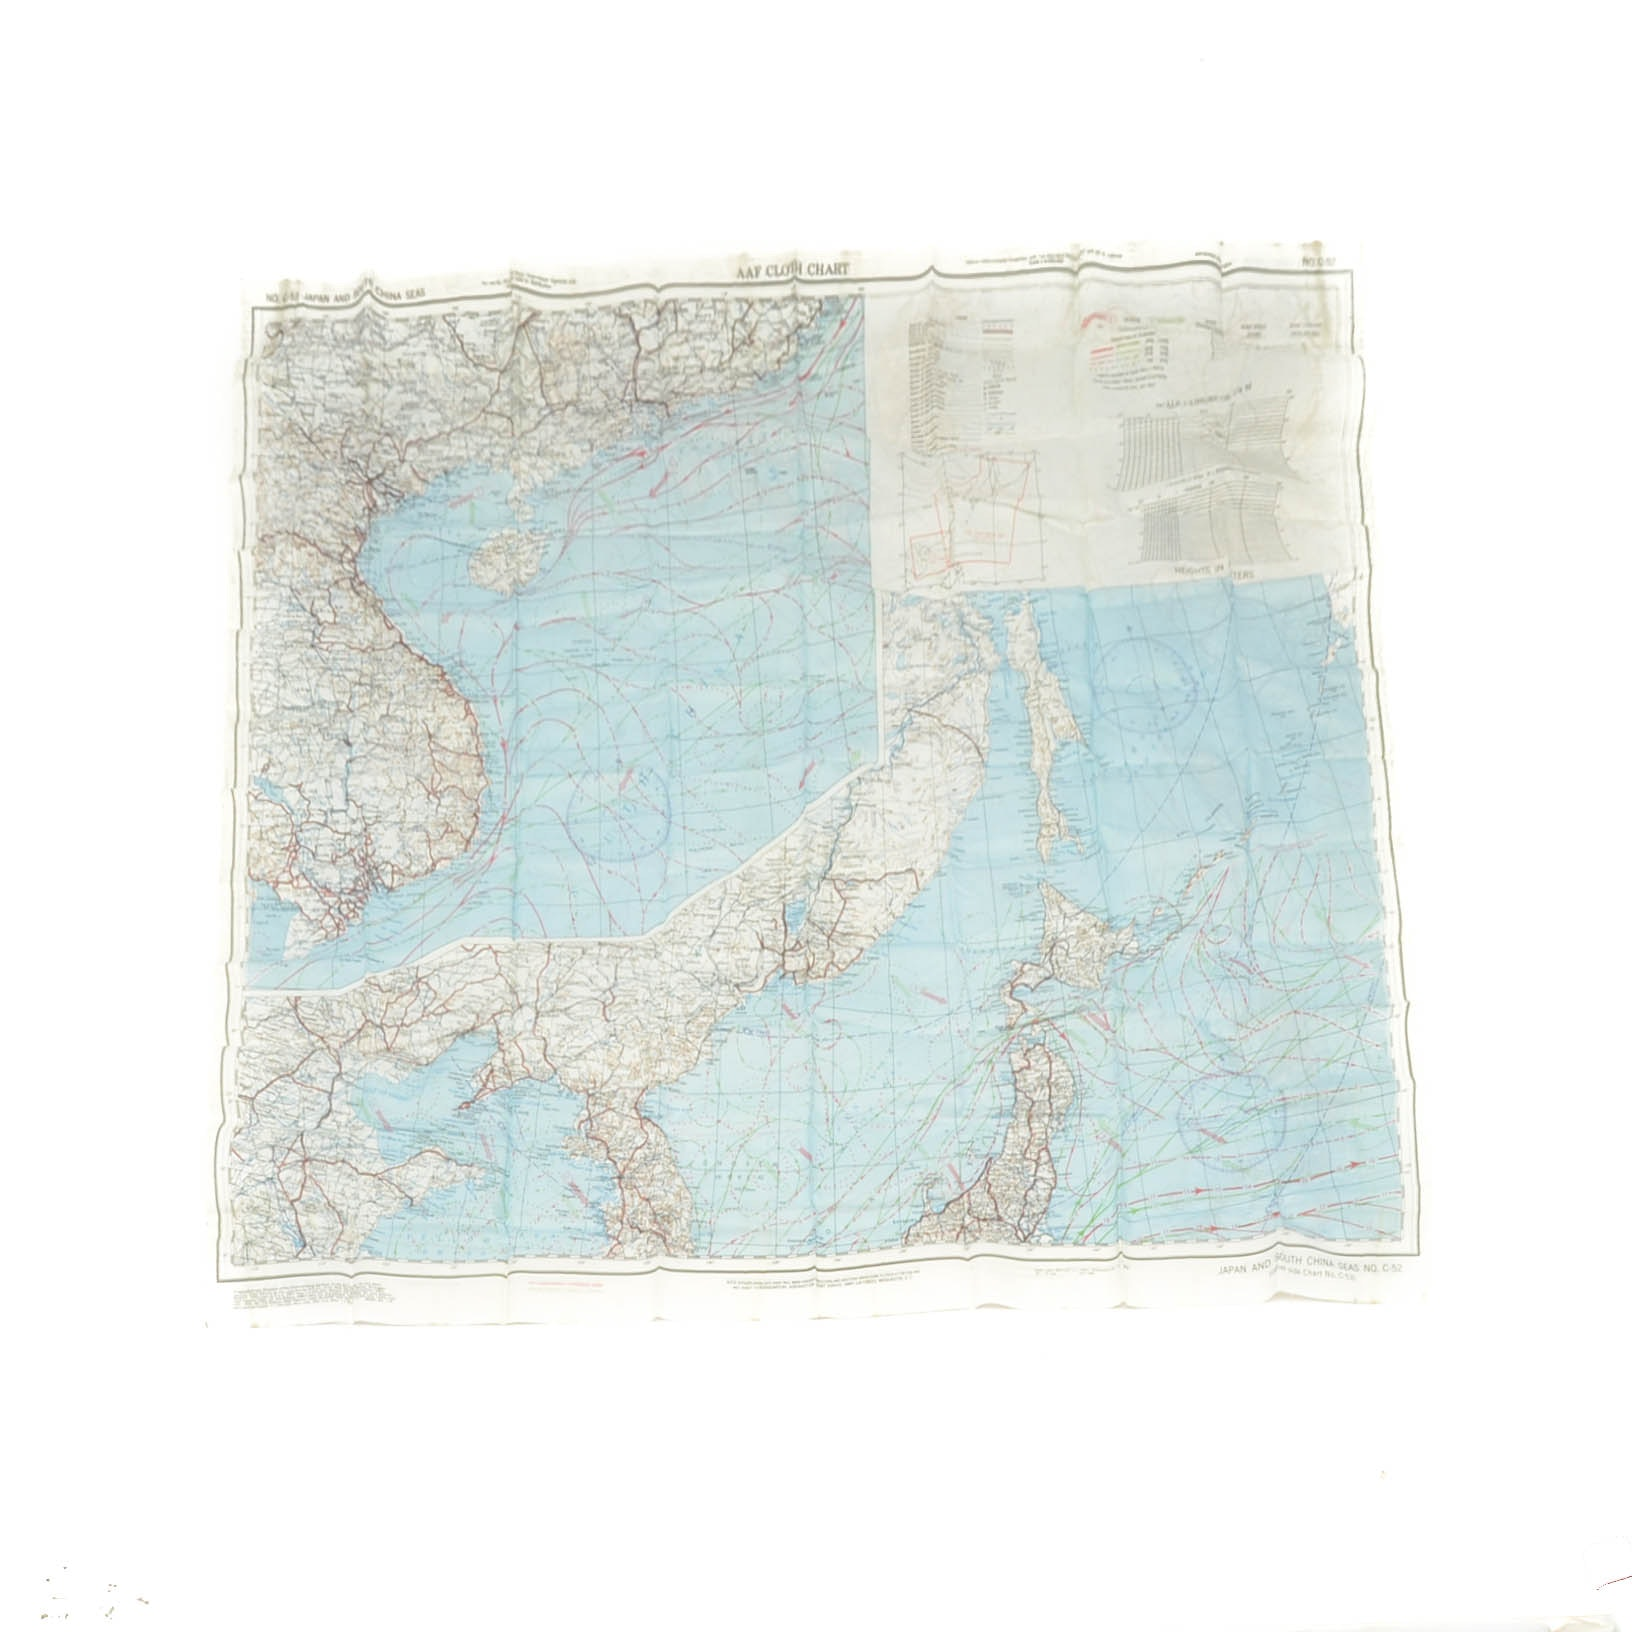 May 1945 Military Cloth Map of Japan